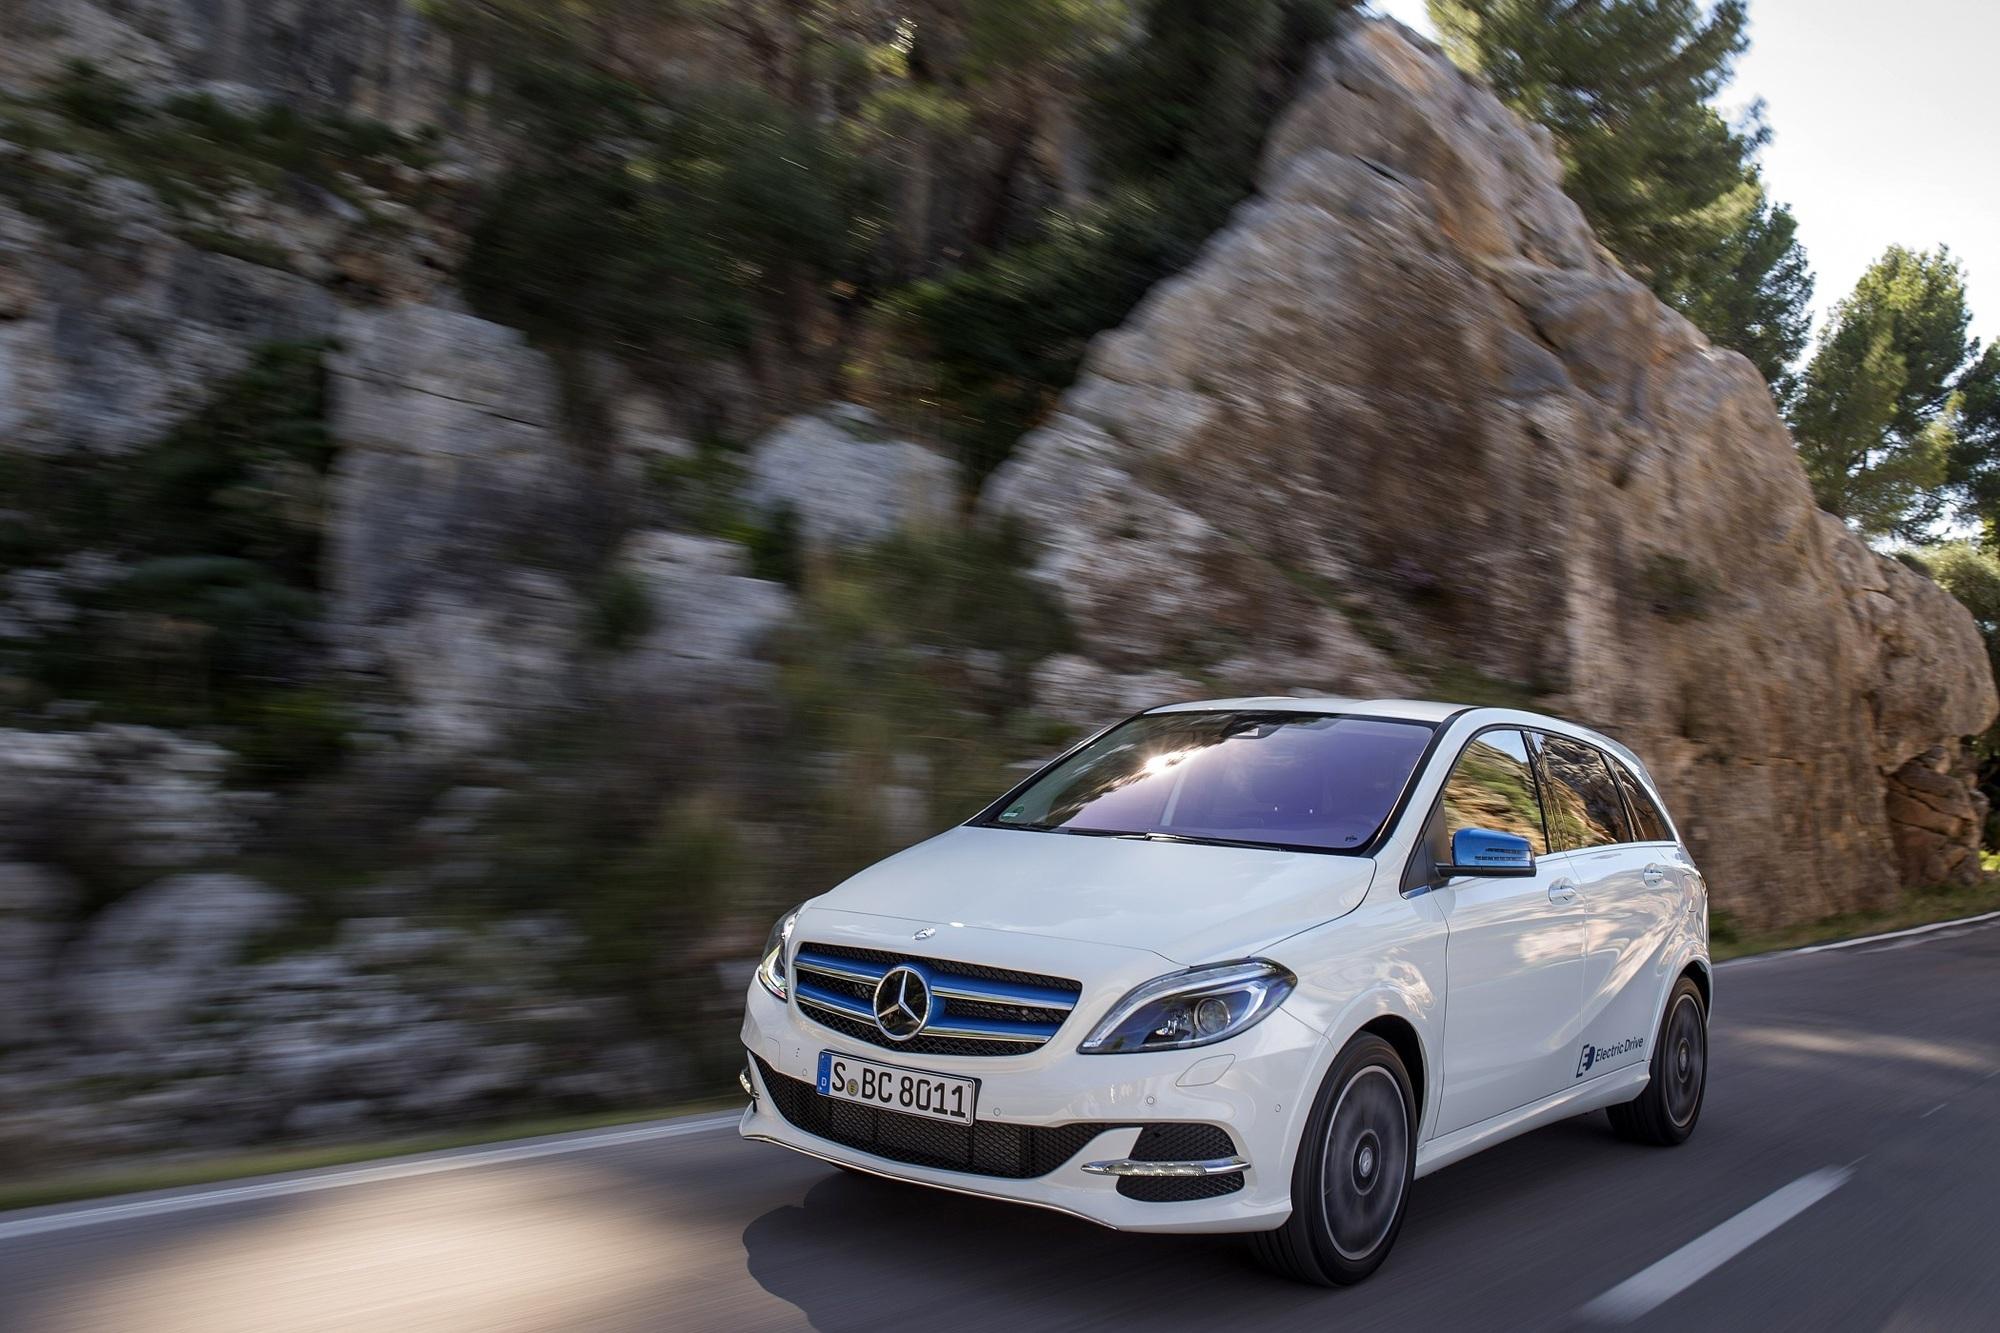 Fahrbericht: Mercedes B-Klasse Electric Drive - Unspektakulär verstromt